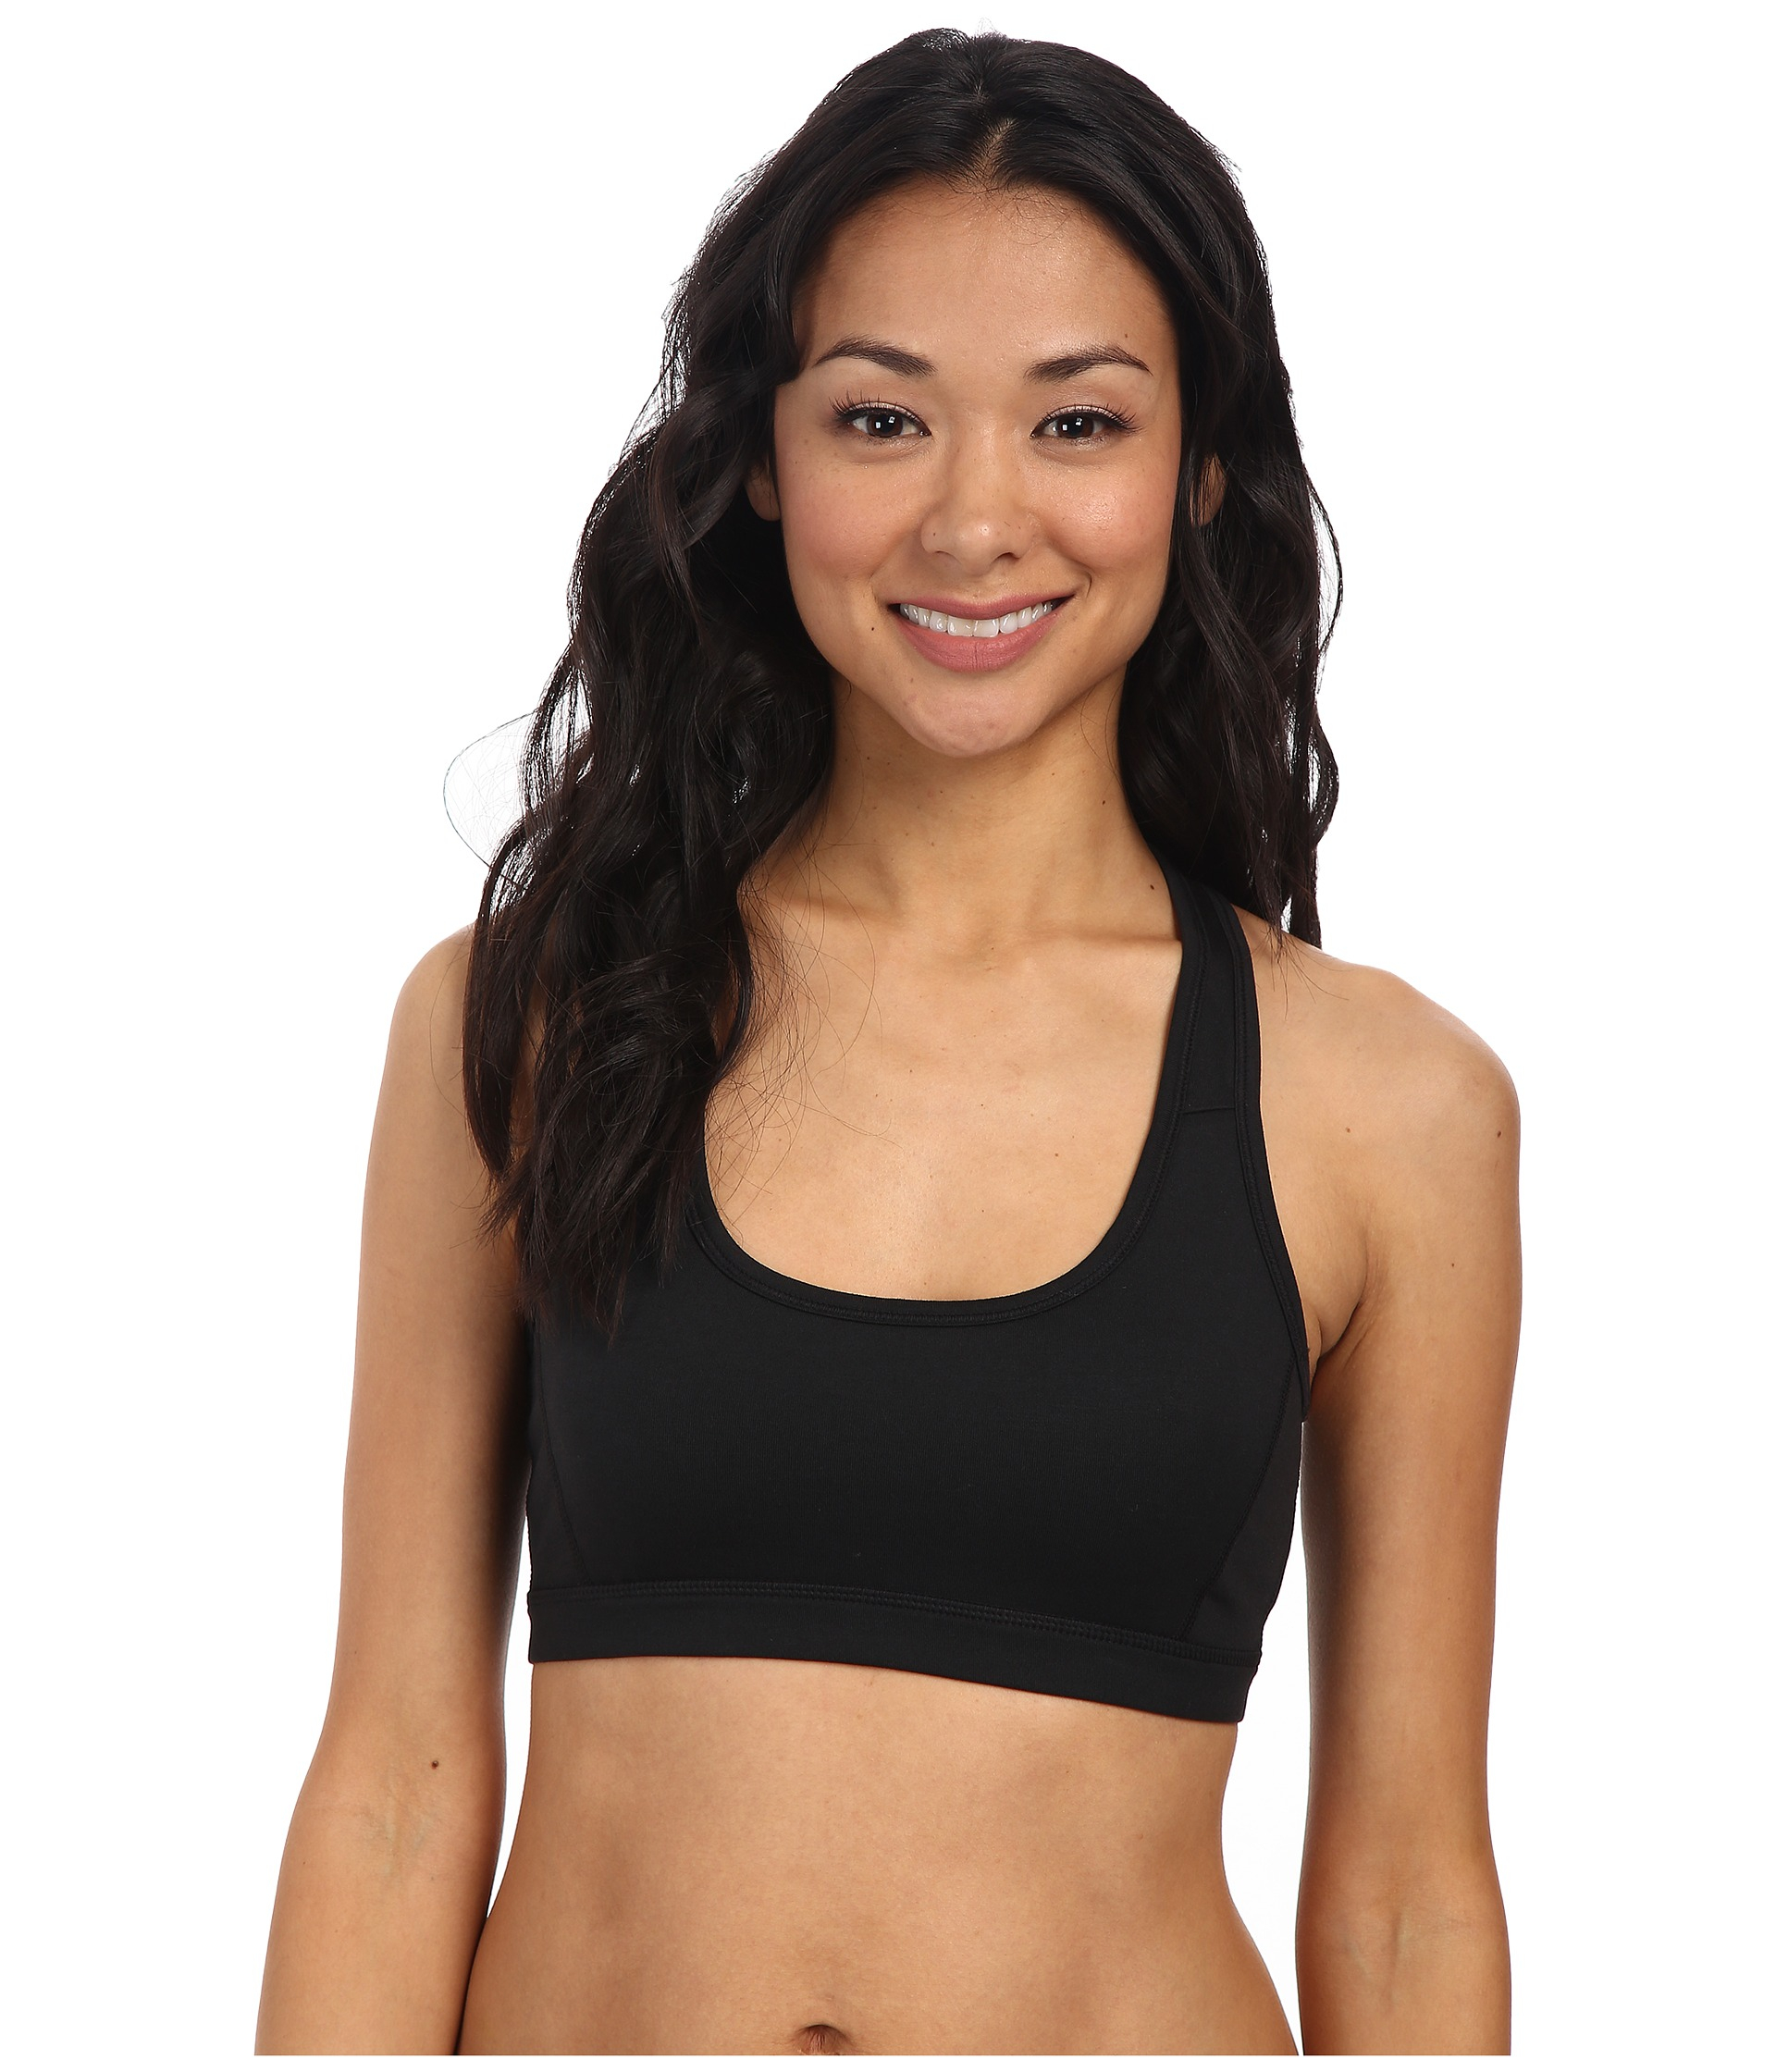 Mountain Hardwear Mighty Activa Sportbra Black Women's Running Underwear 8451661